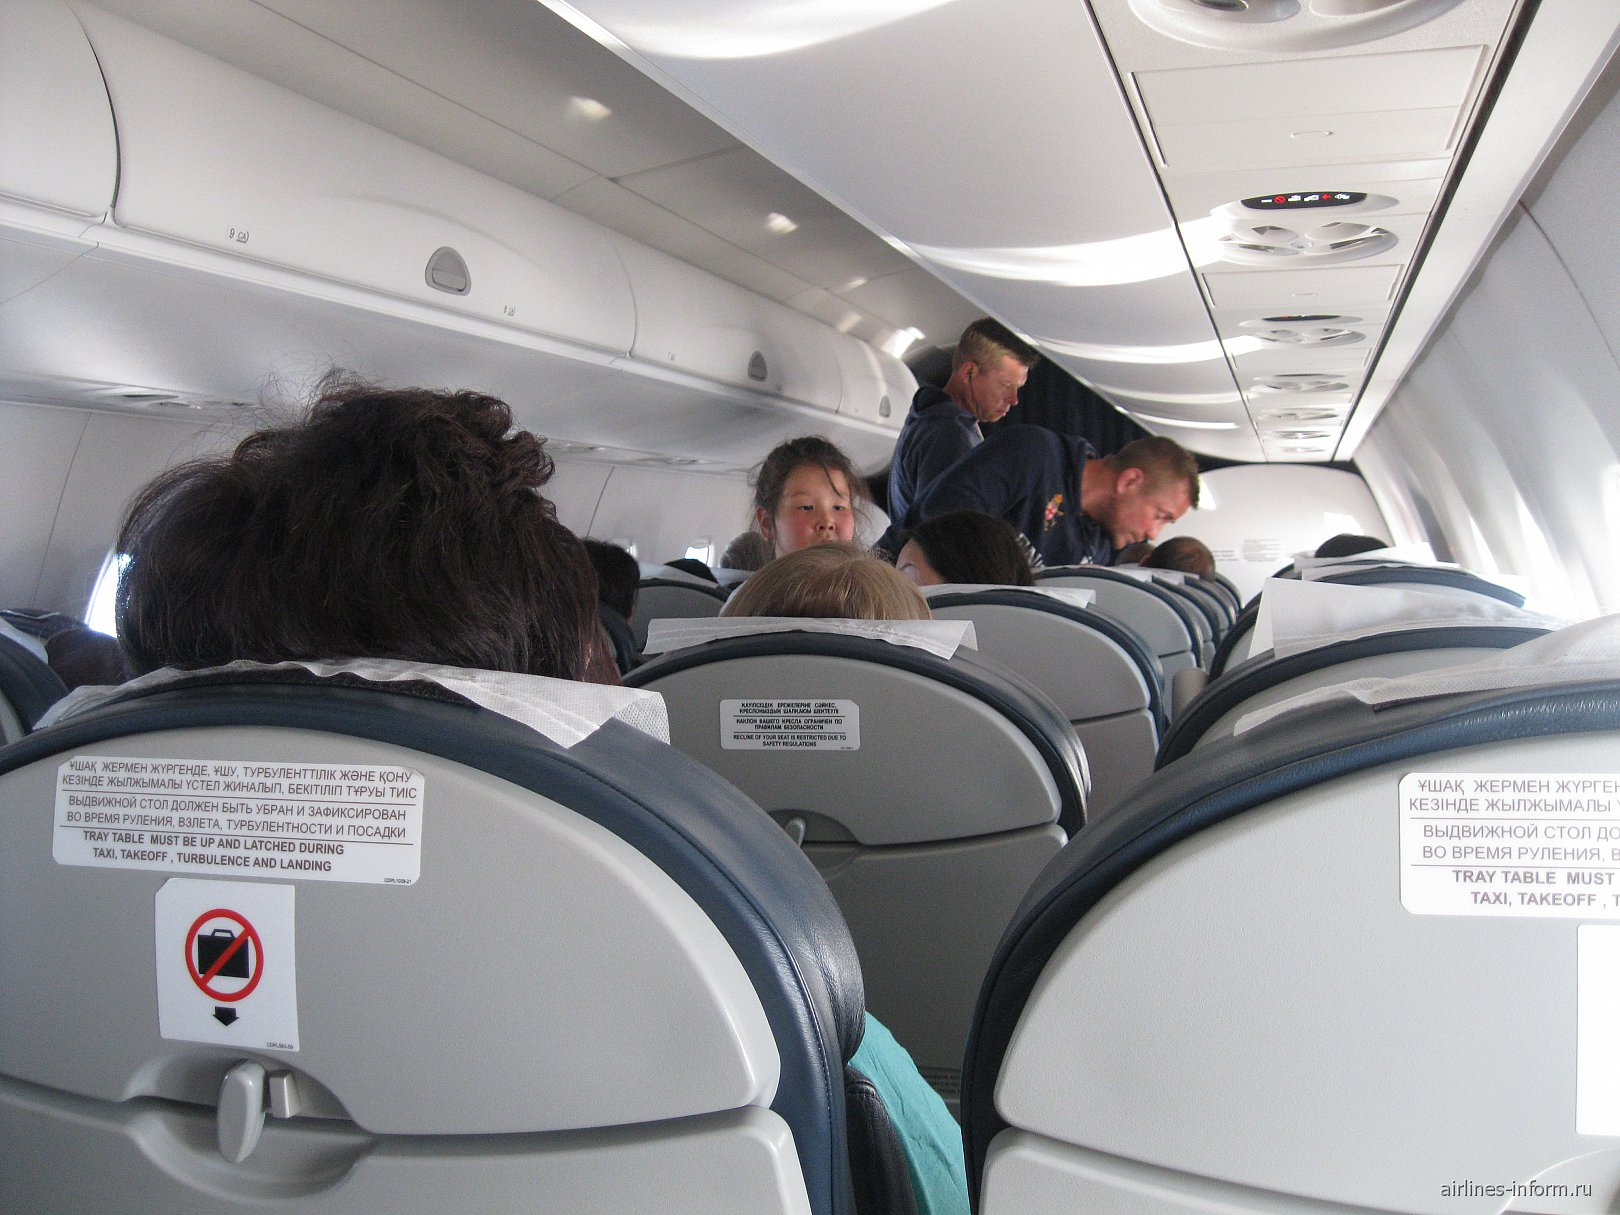 Салон самолета Эмбраер-1900 авиакомпании Эйр Астана